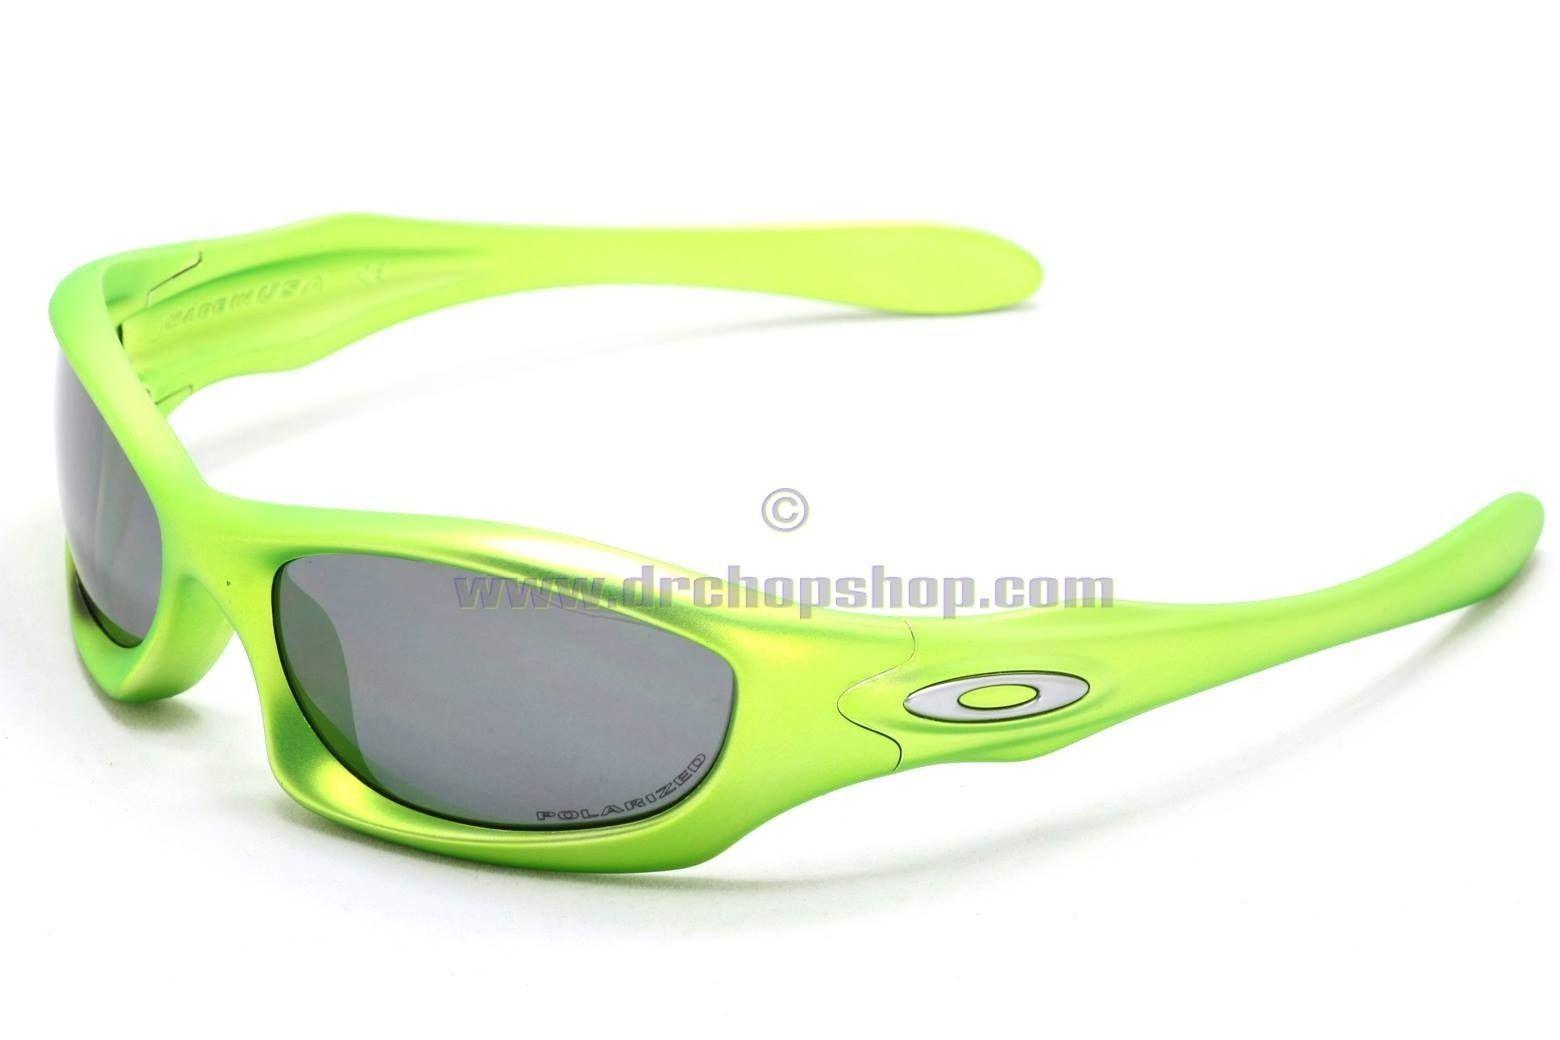 Couple Of Cool Customs - 1082599_660748383936851_1131769956_o.jpg